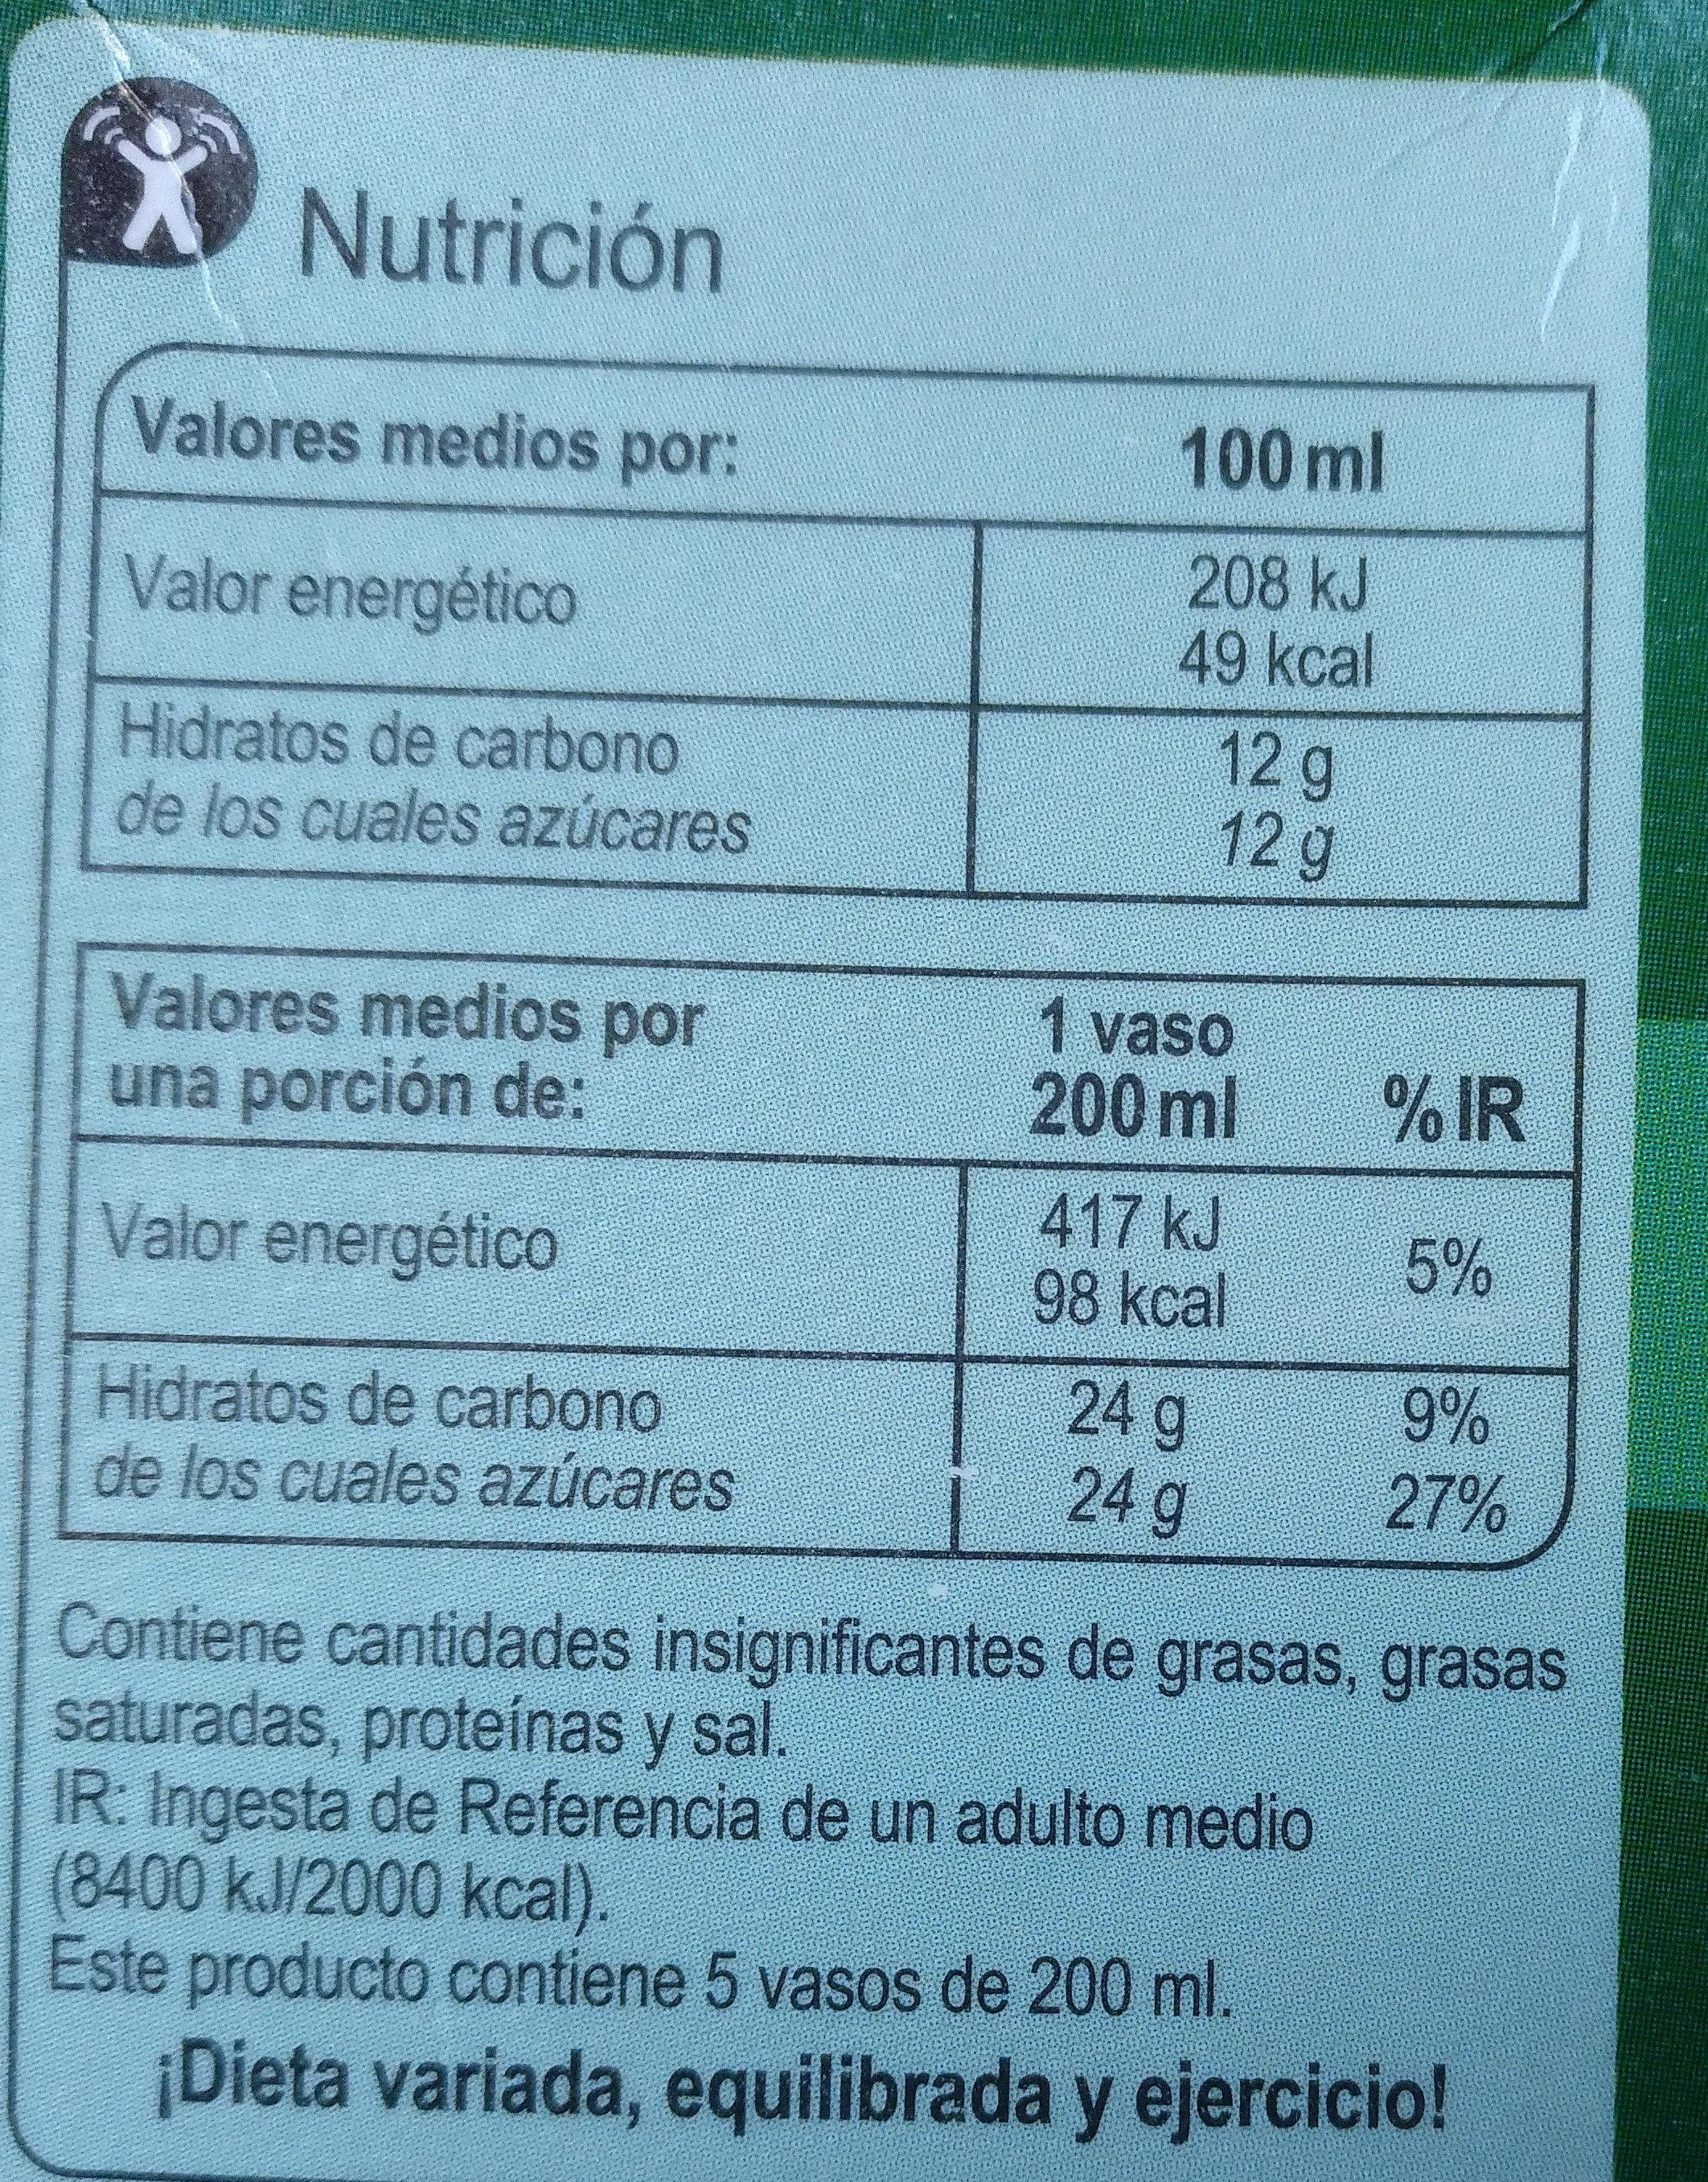 Zumopiña100% exprimido - Información nutricional - es